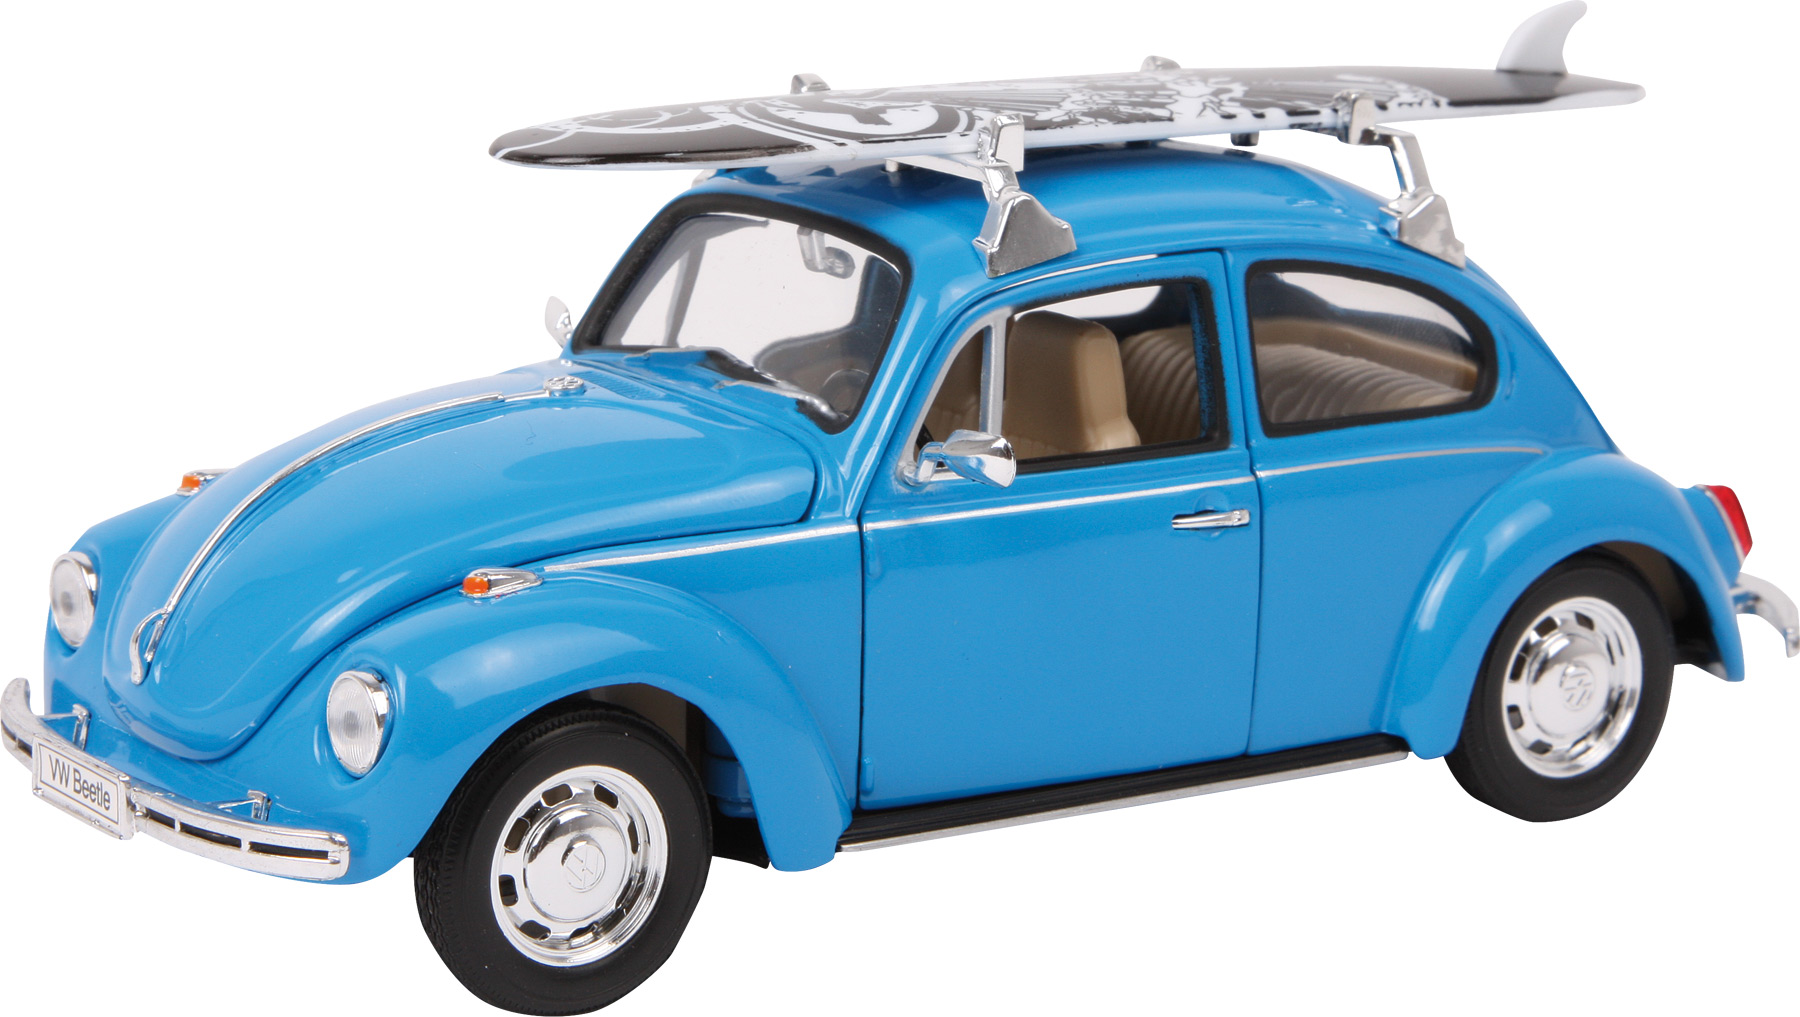 Small Foot Model auta VW Beetle se surfem